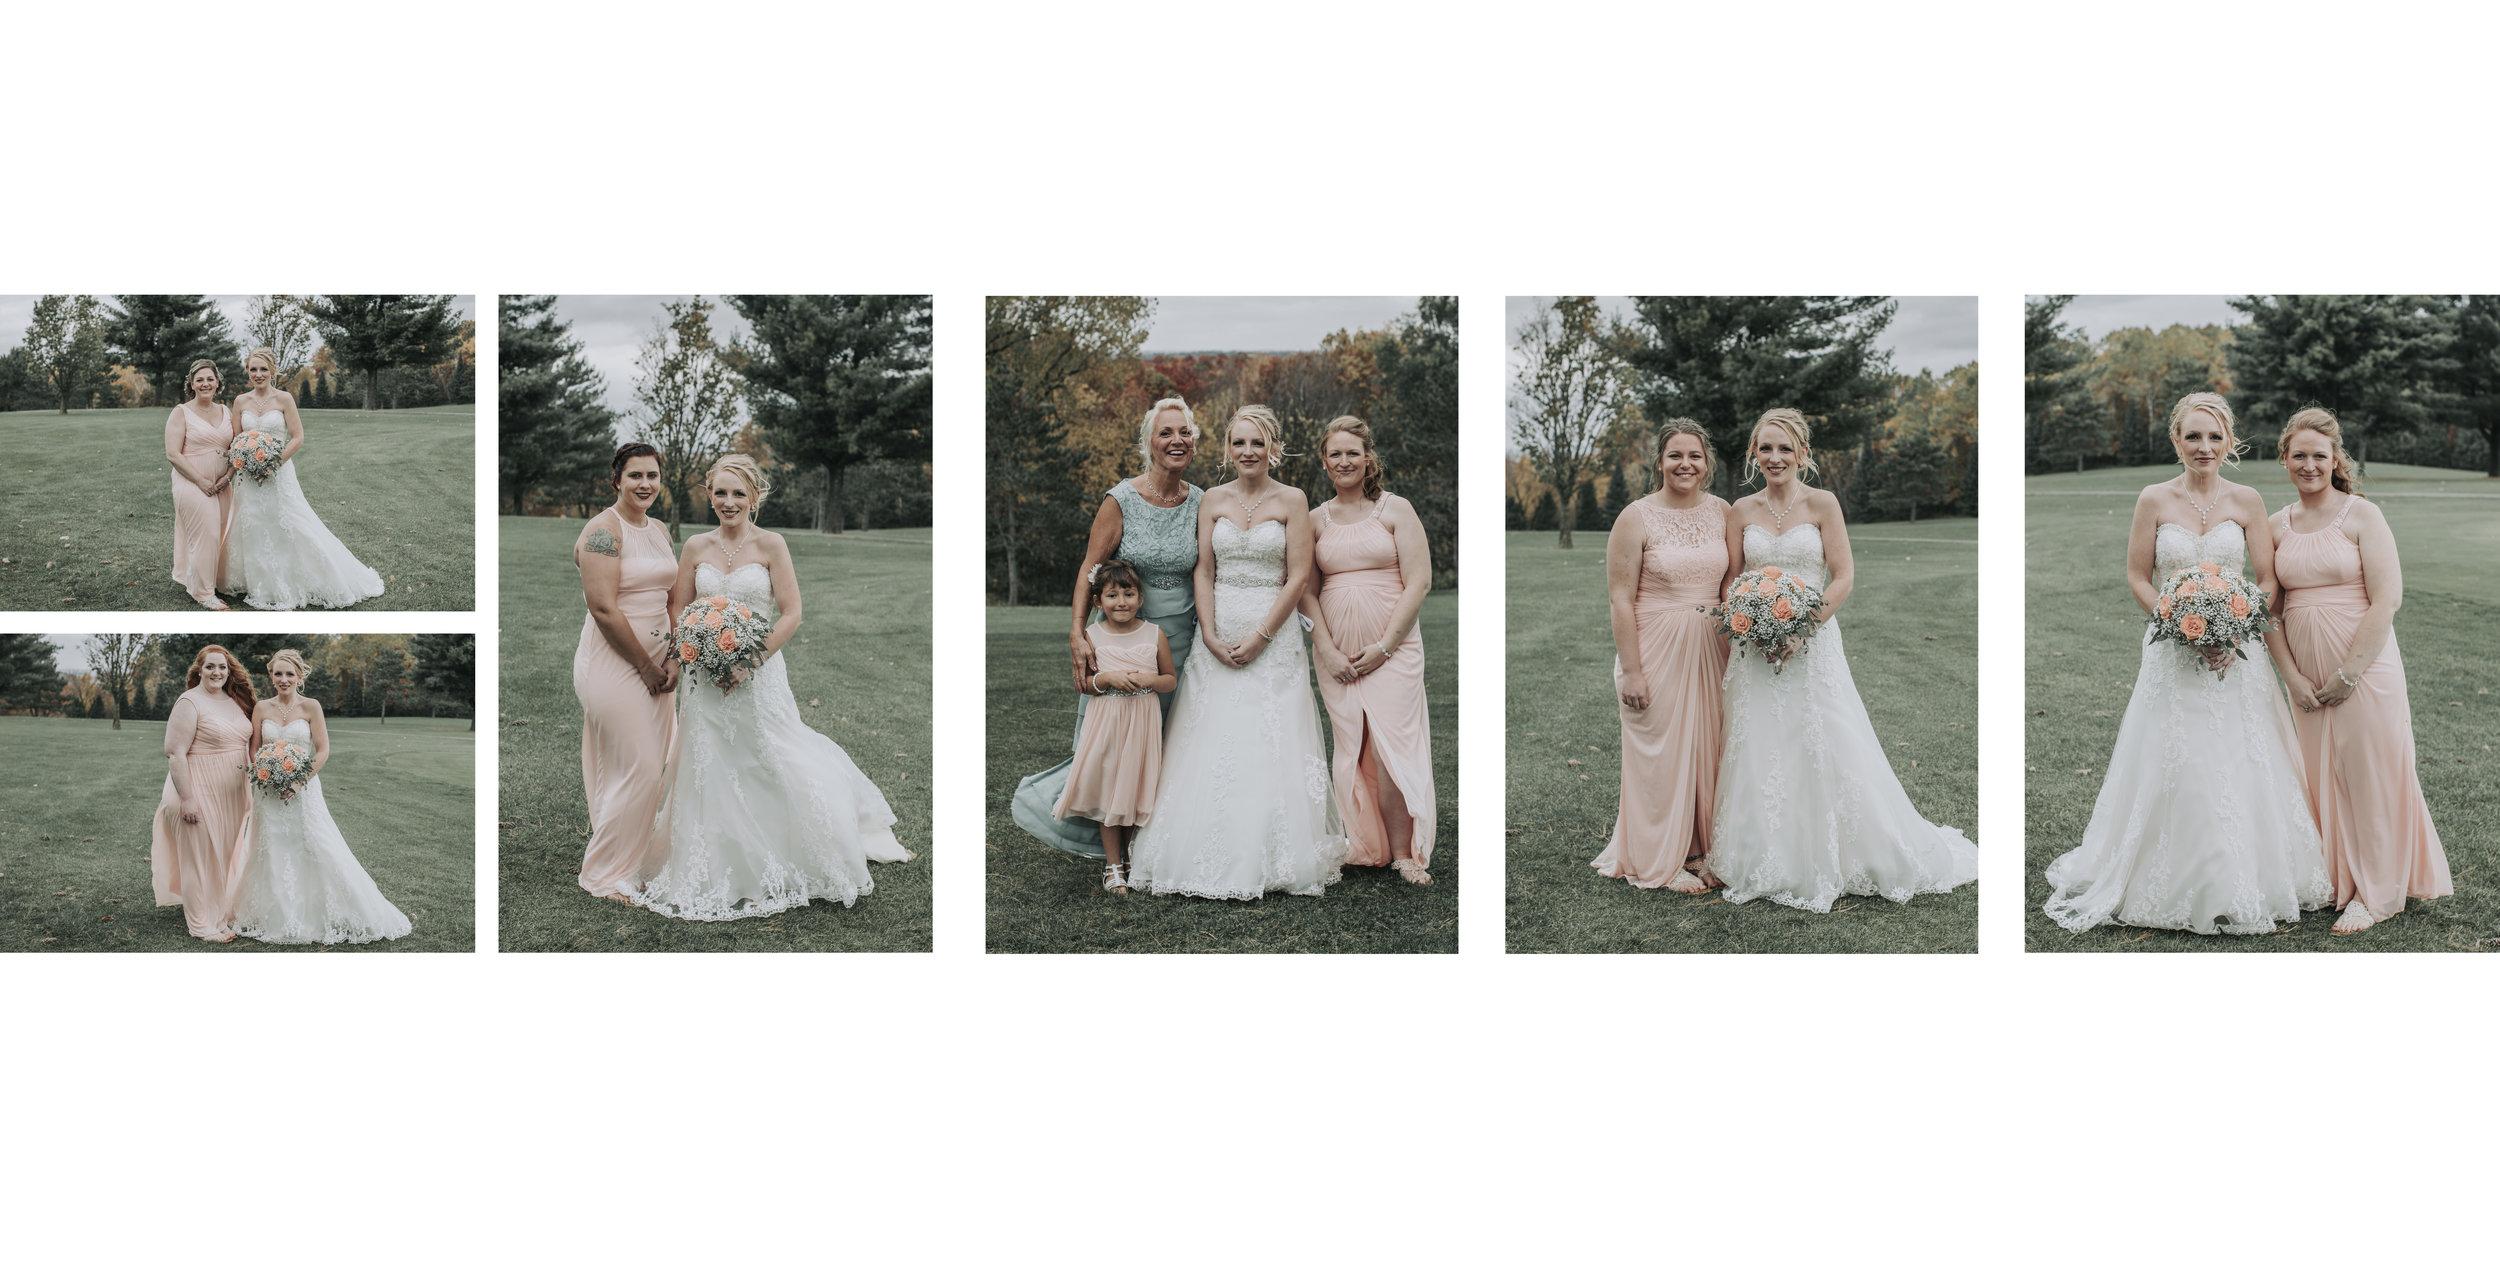 Bridesmaids - Hove Photography LLC